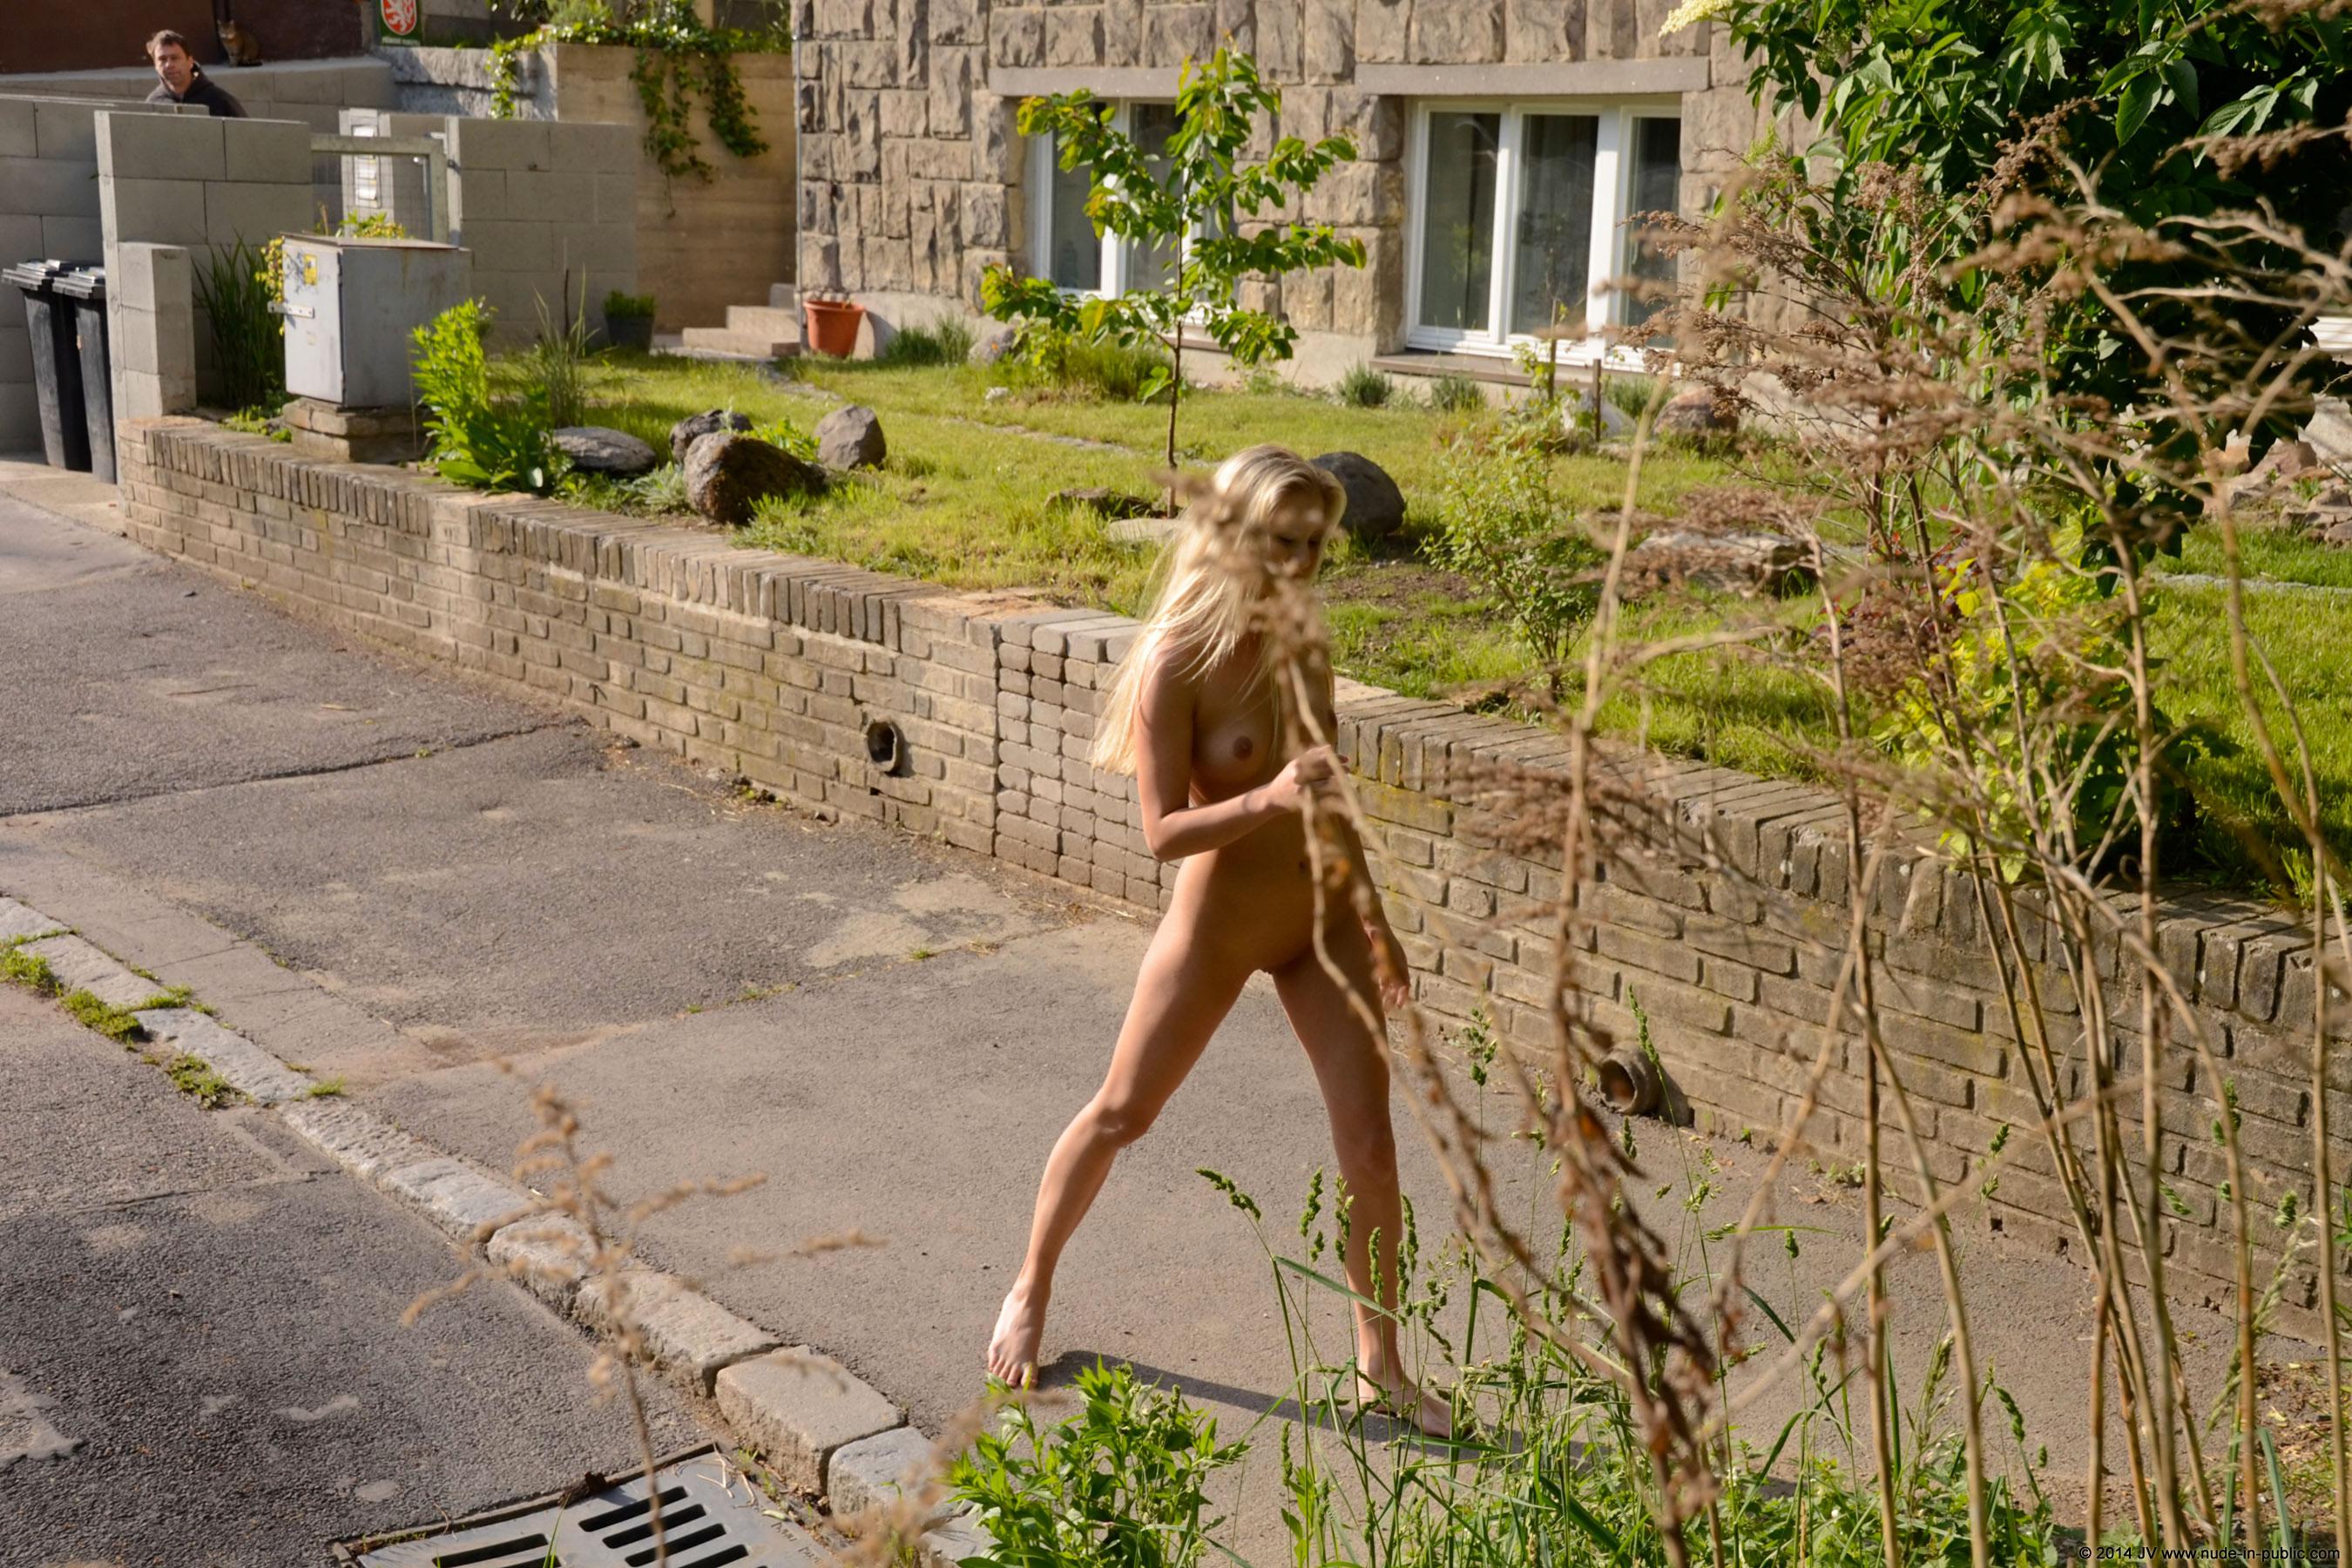 karolina-m-blonde-on-the-street-nude-in-public-14